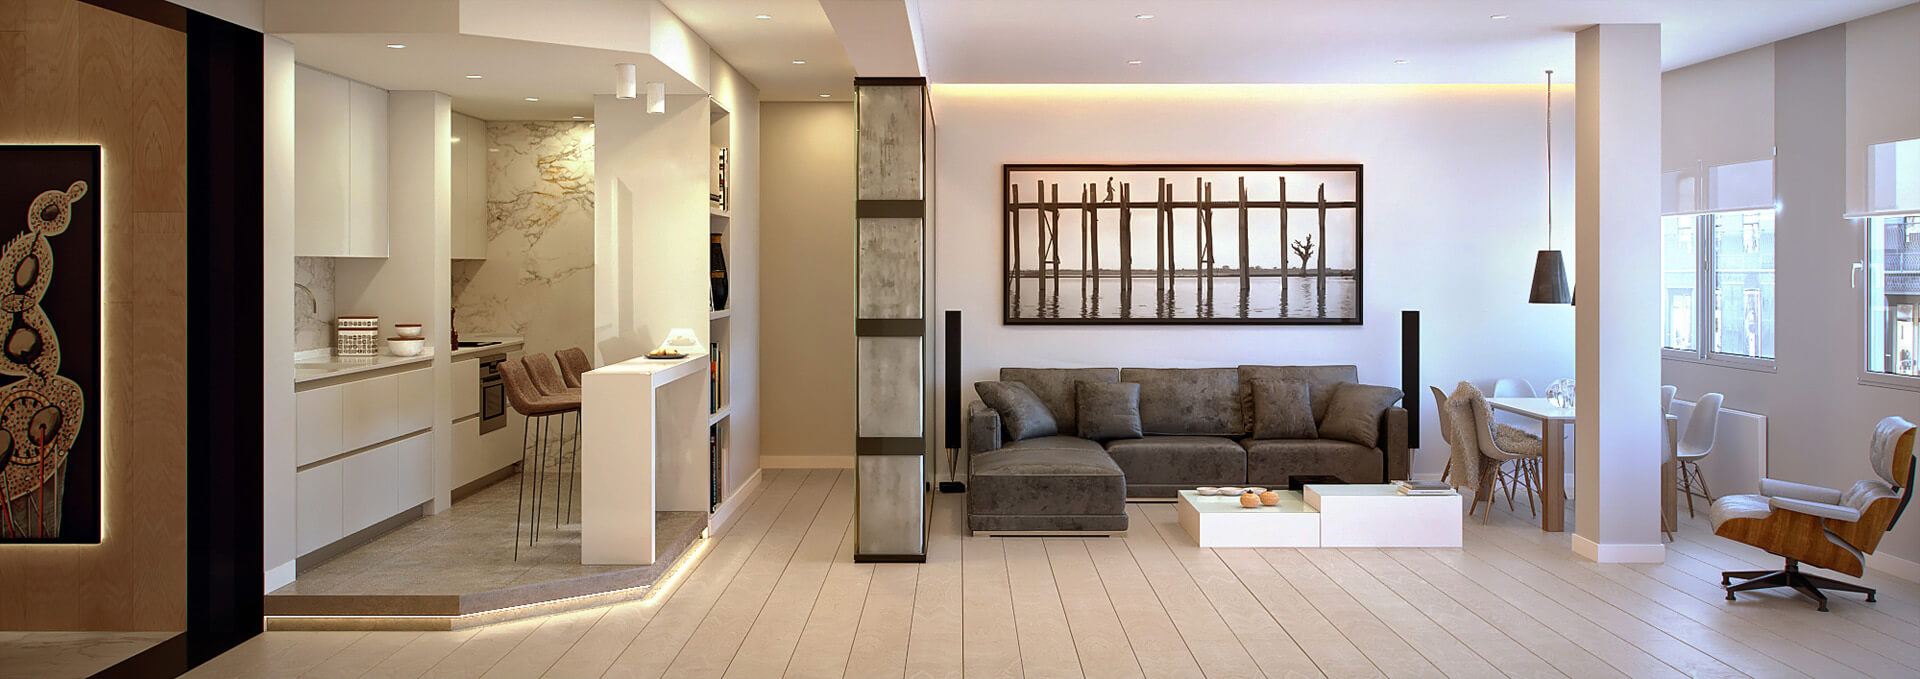 Apartamento Blasco de Garay - archidomstudio.com